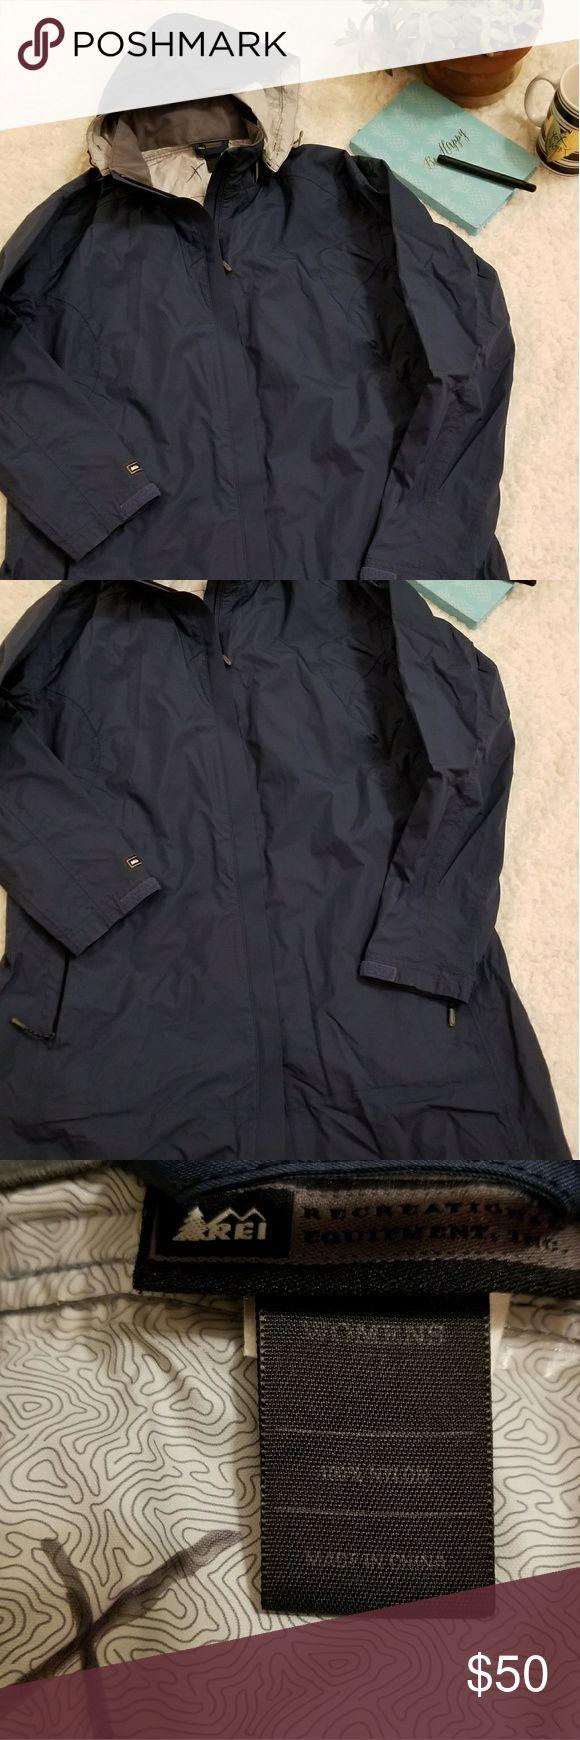 REI lightweight womens rain jacket Used lightweight jacket REI Jackets & Coats